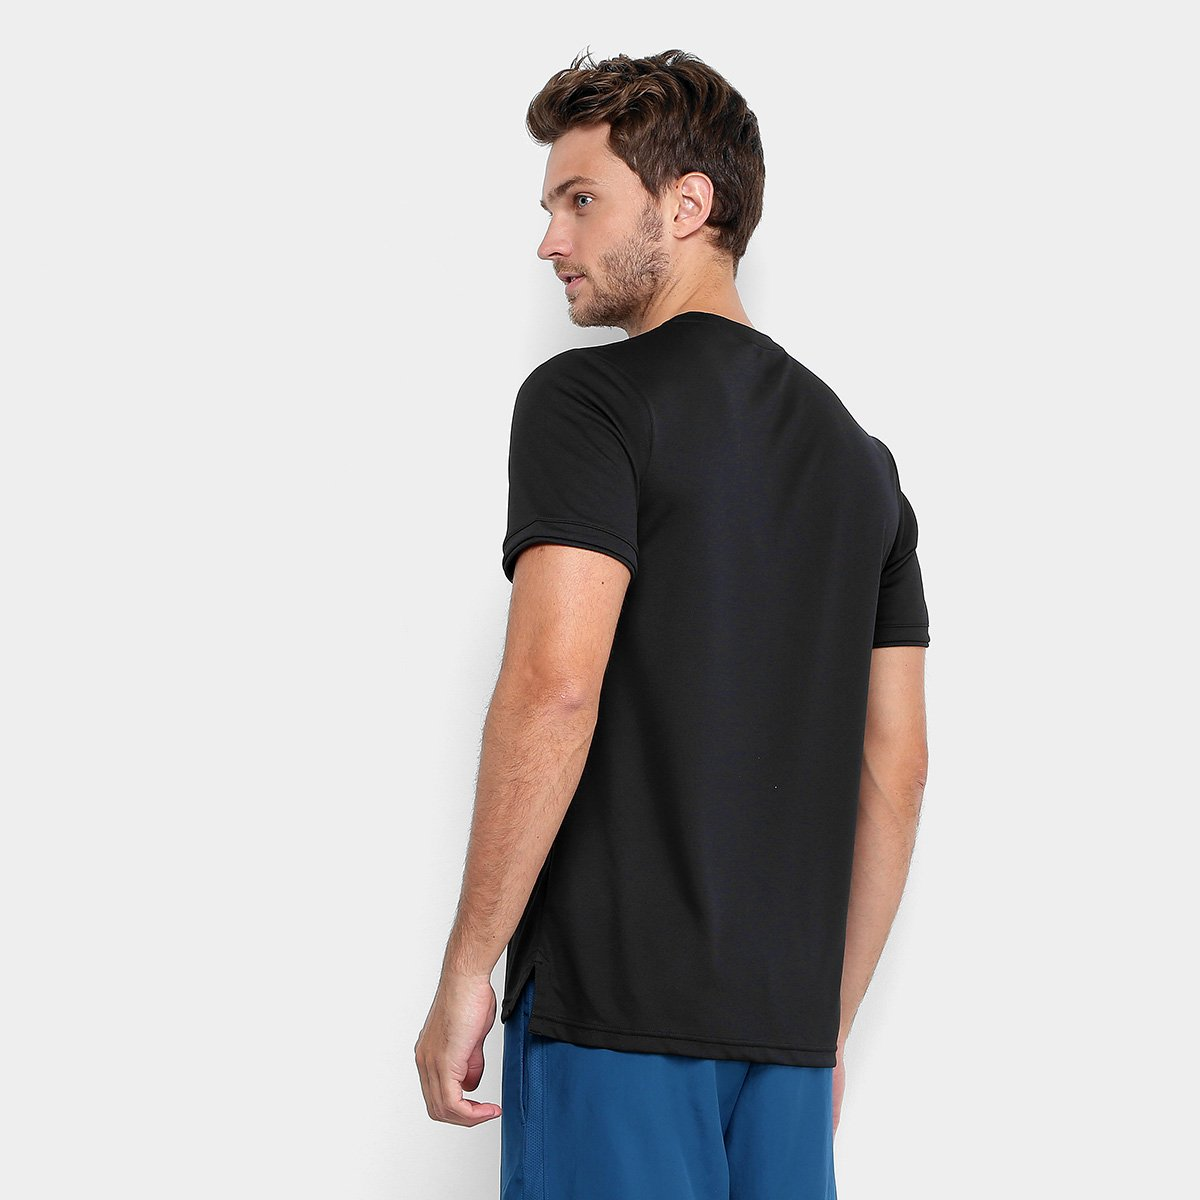 Camiseta Nike Top Team Masculina - Compre Agora  480cd1090aa5a